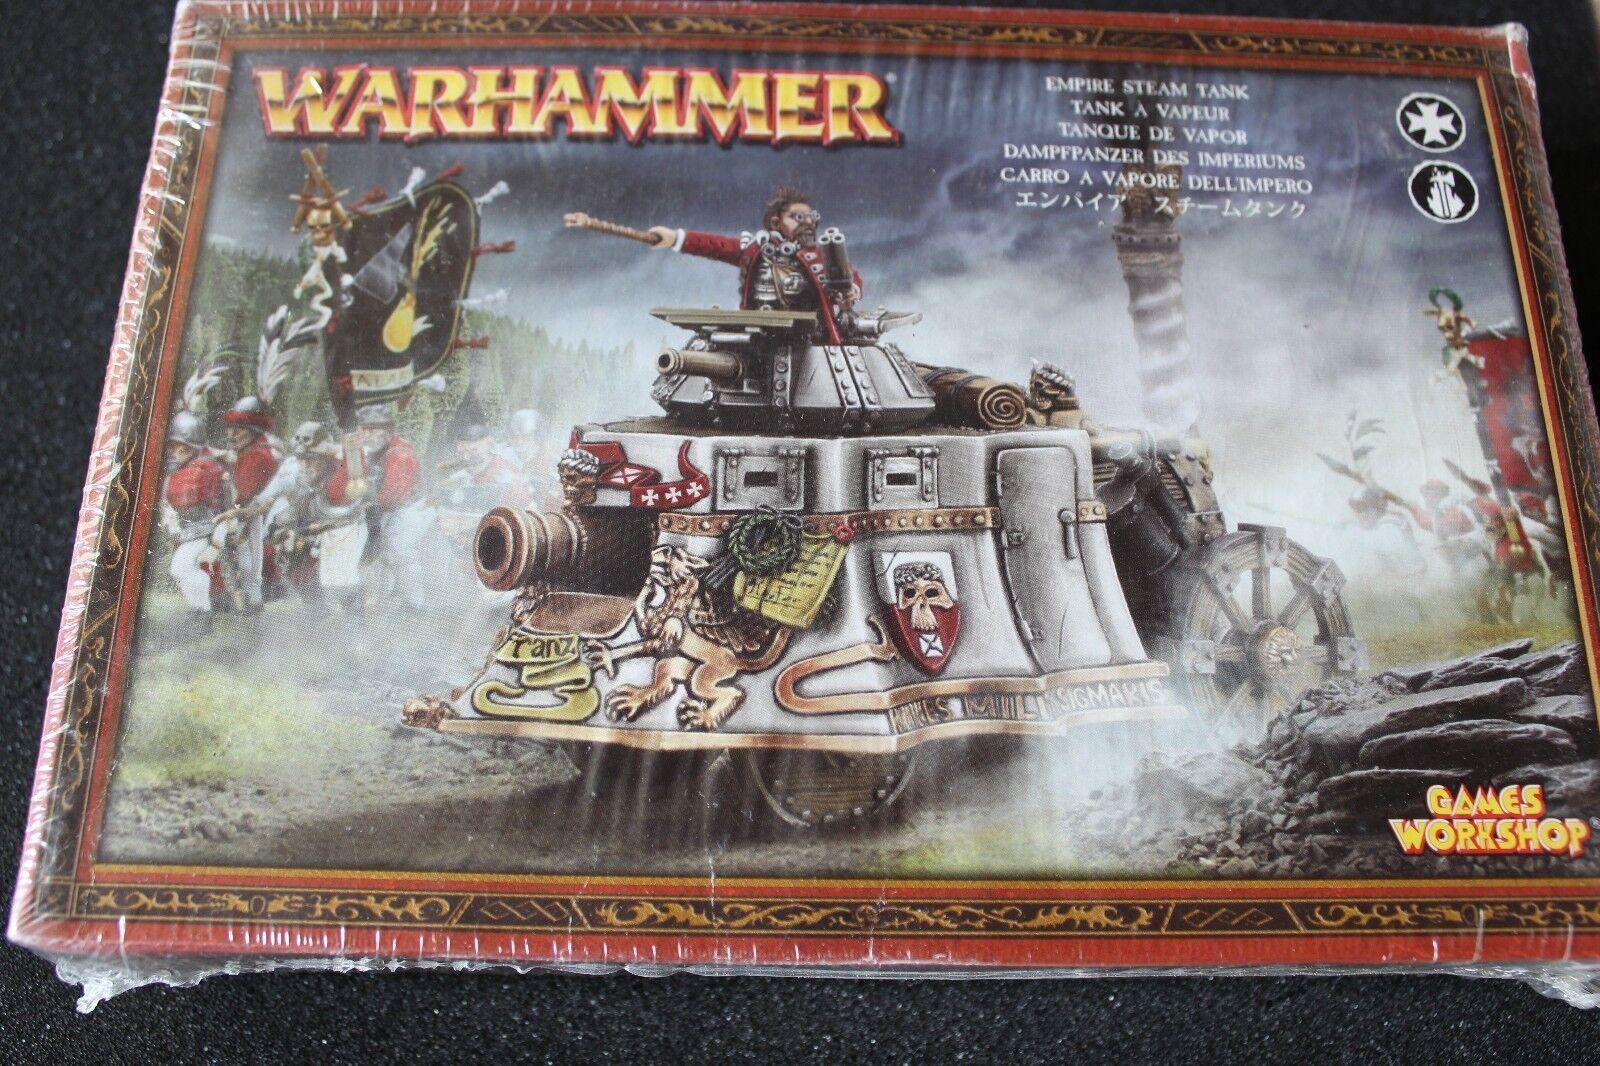 Games Workshop Warhammer L'empire steam tank  métal neuf scellé WH40K Fantasy B2  marque célèbre